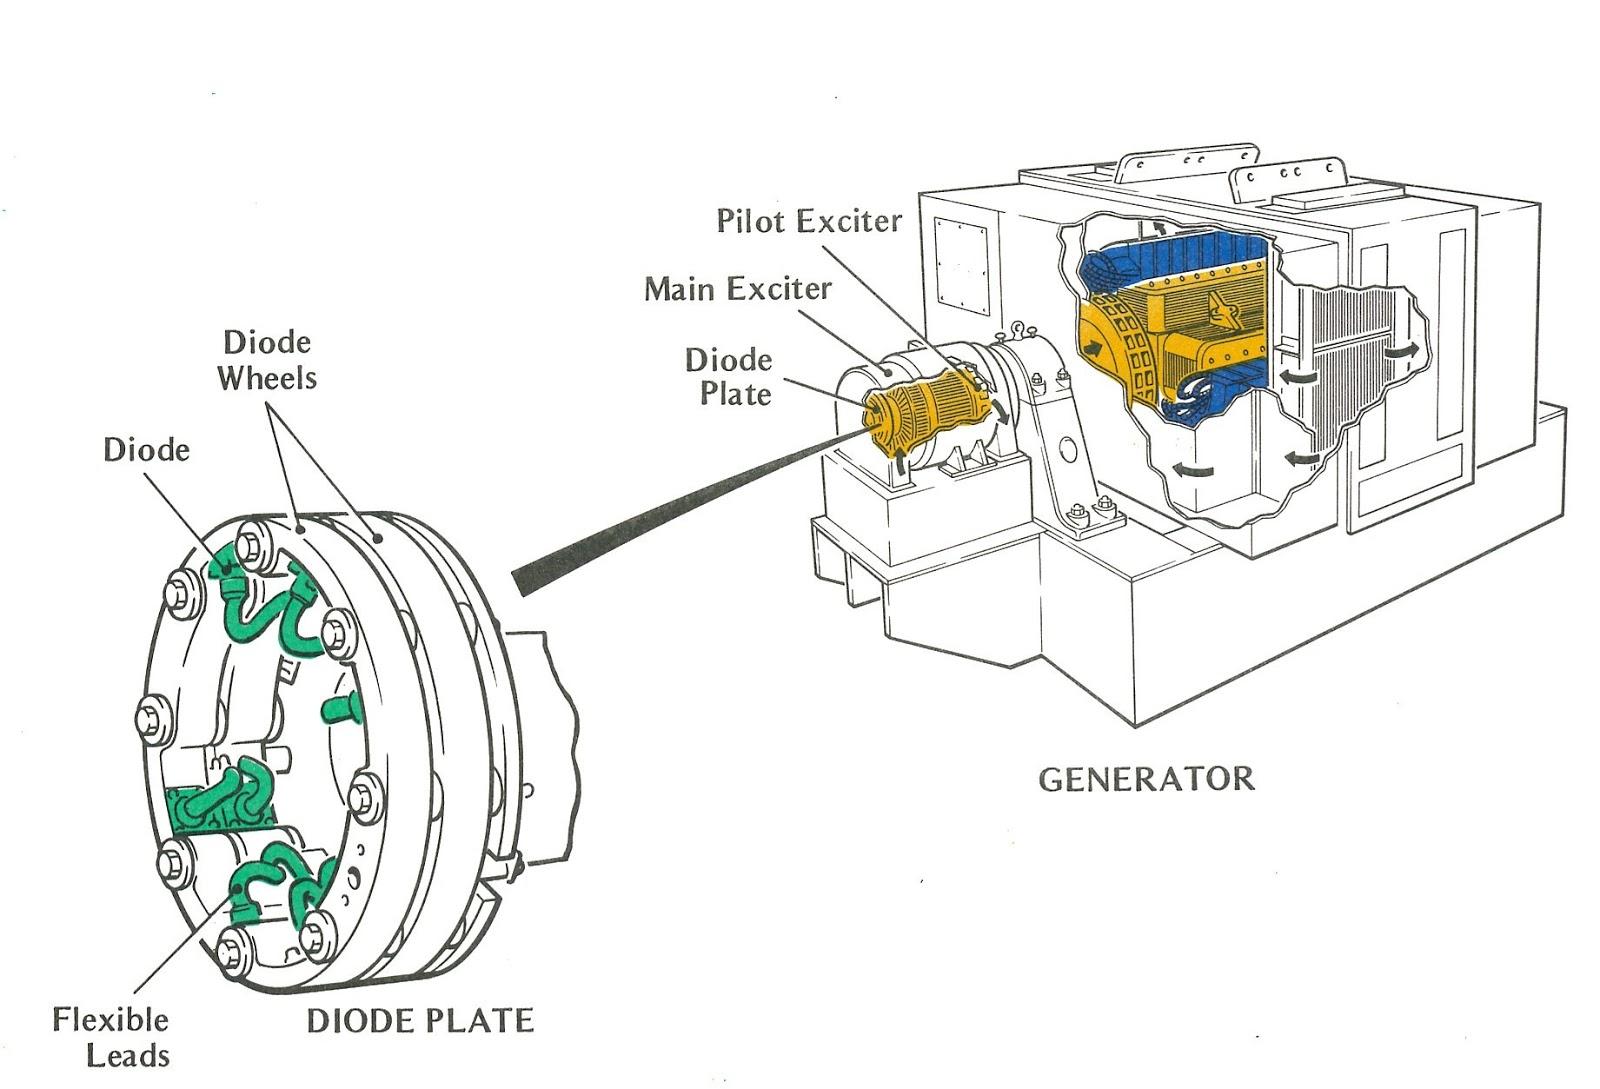 84 chevy truck fuse box diagram image details jpg